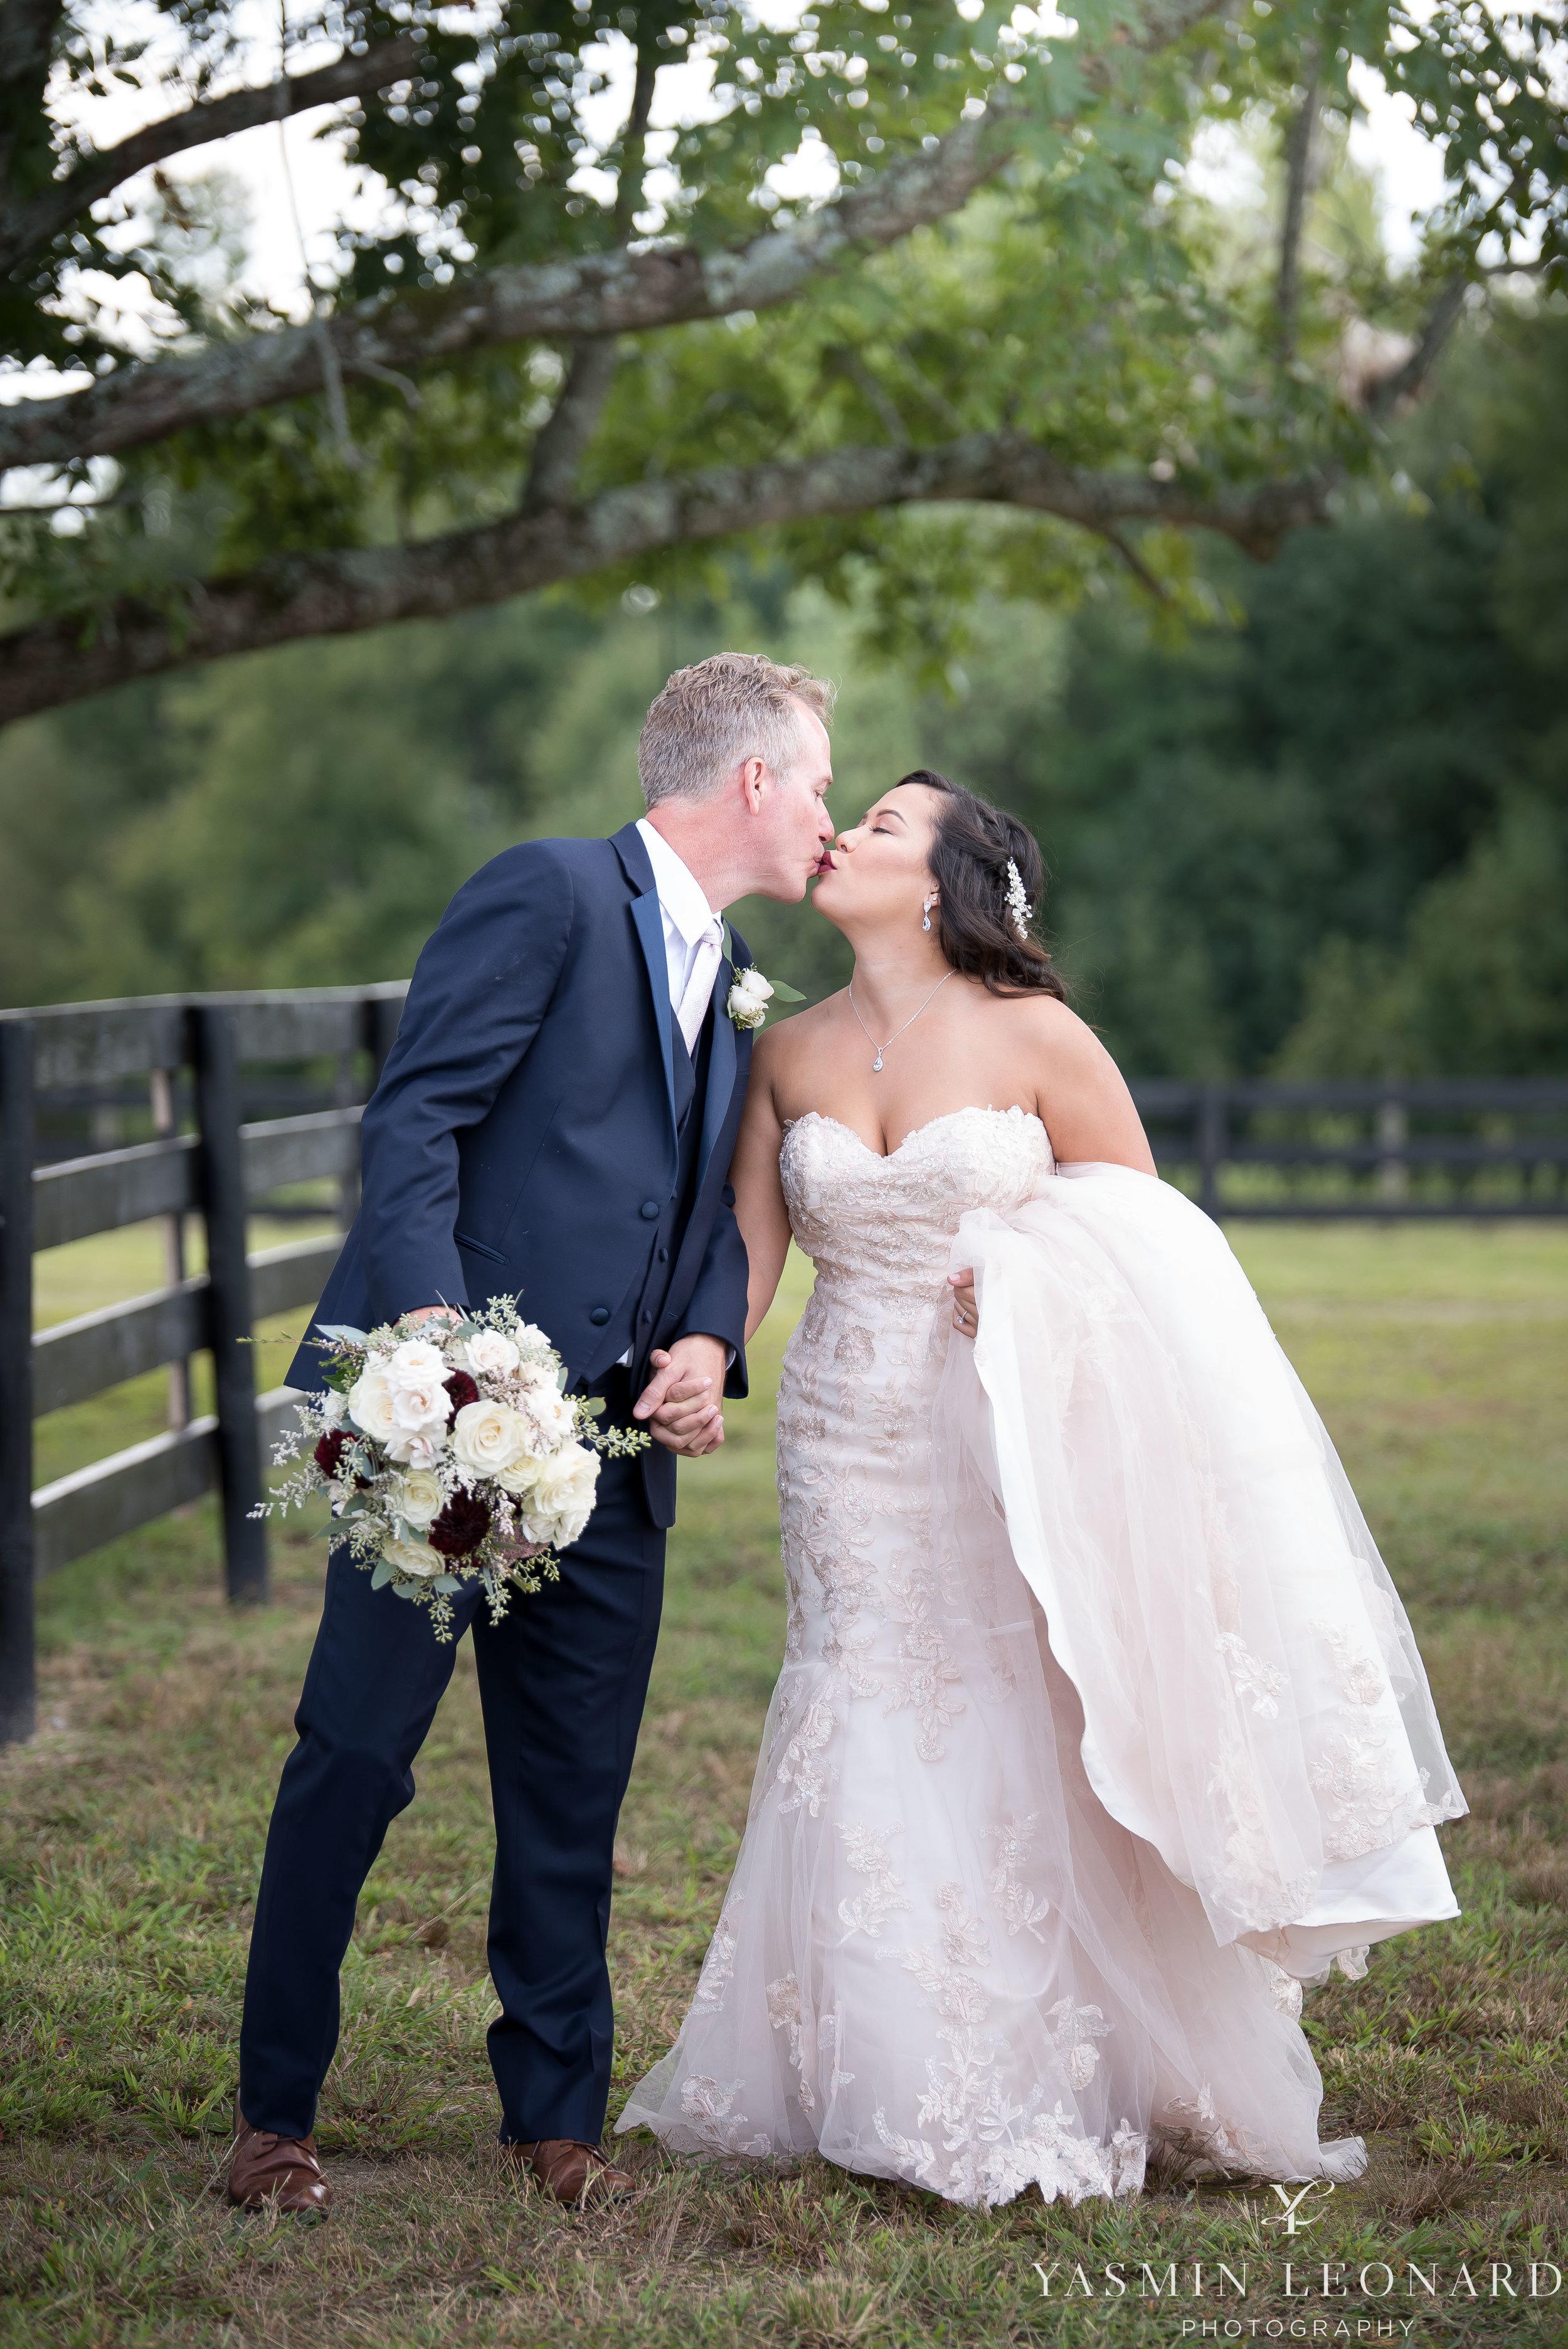 Mason Ridge   Liberty, NC   Aylissa and John   Yasmin Leonard Photography-48.jpg